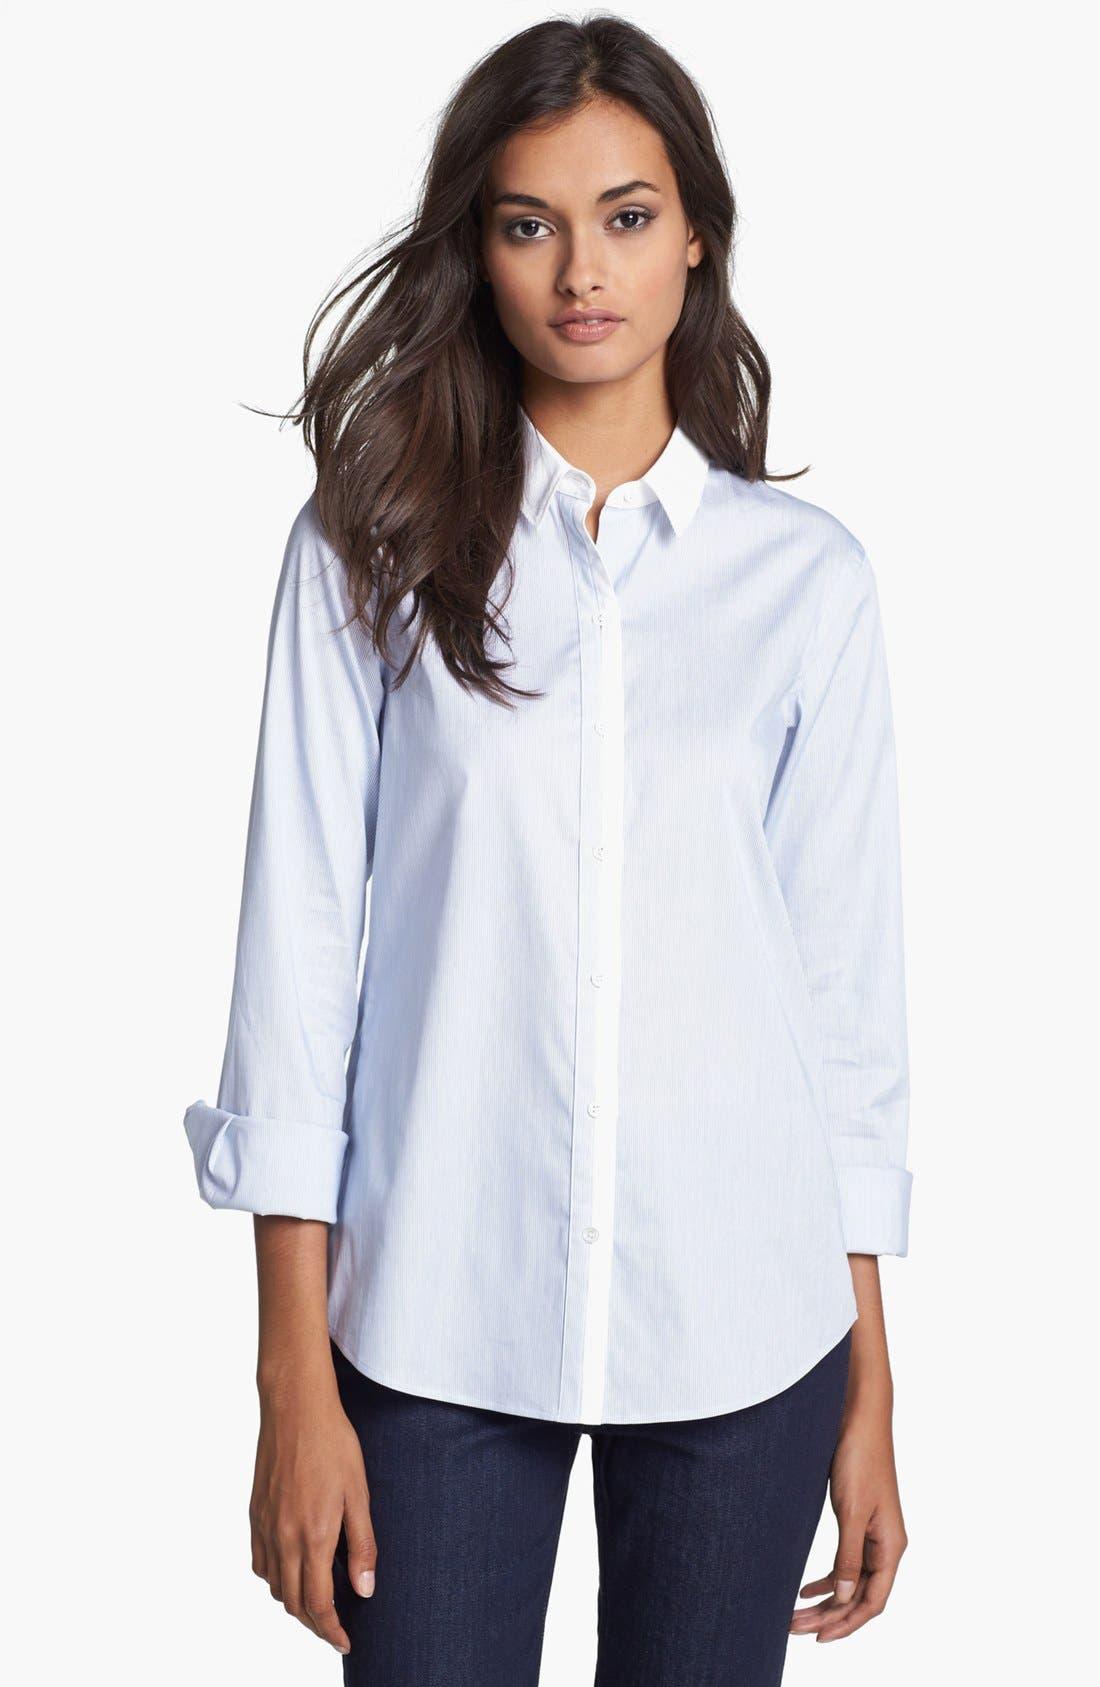 Alternate Image 1 Selected - Theory 'Yasa' Stretch Shirt